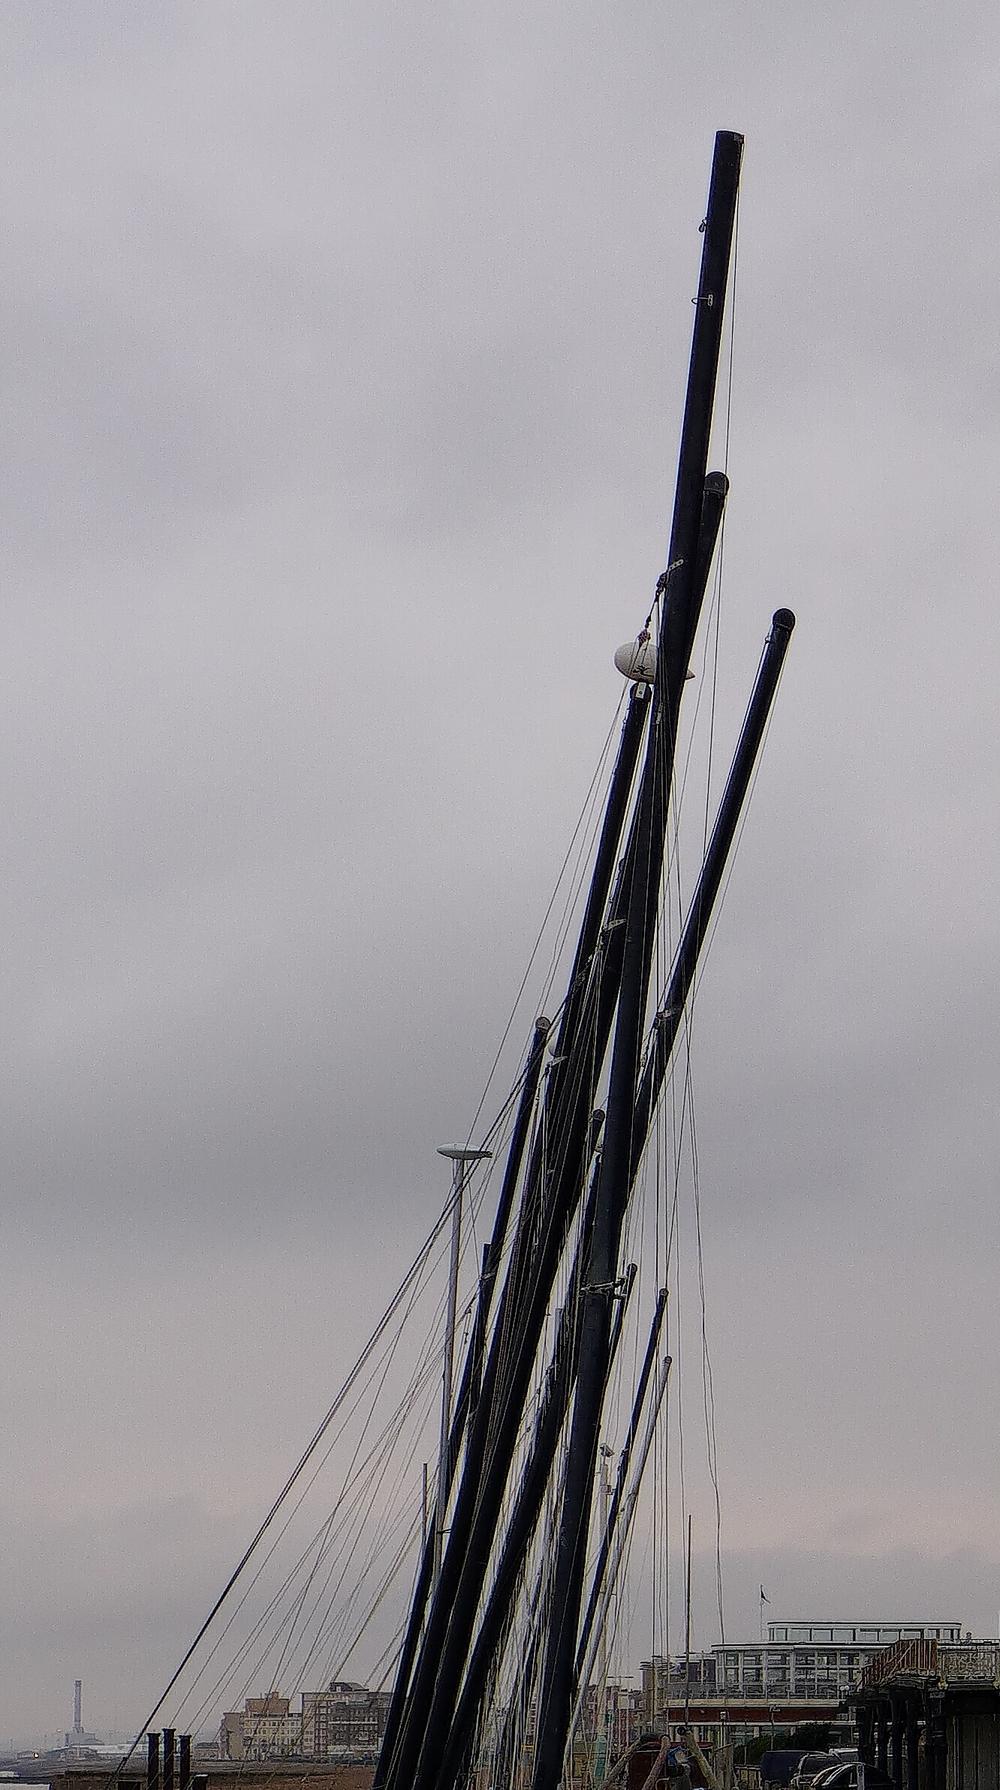 Masts 1